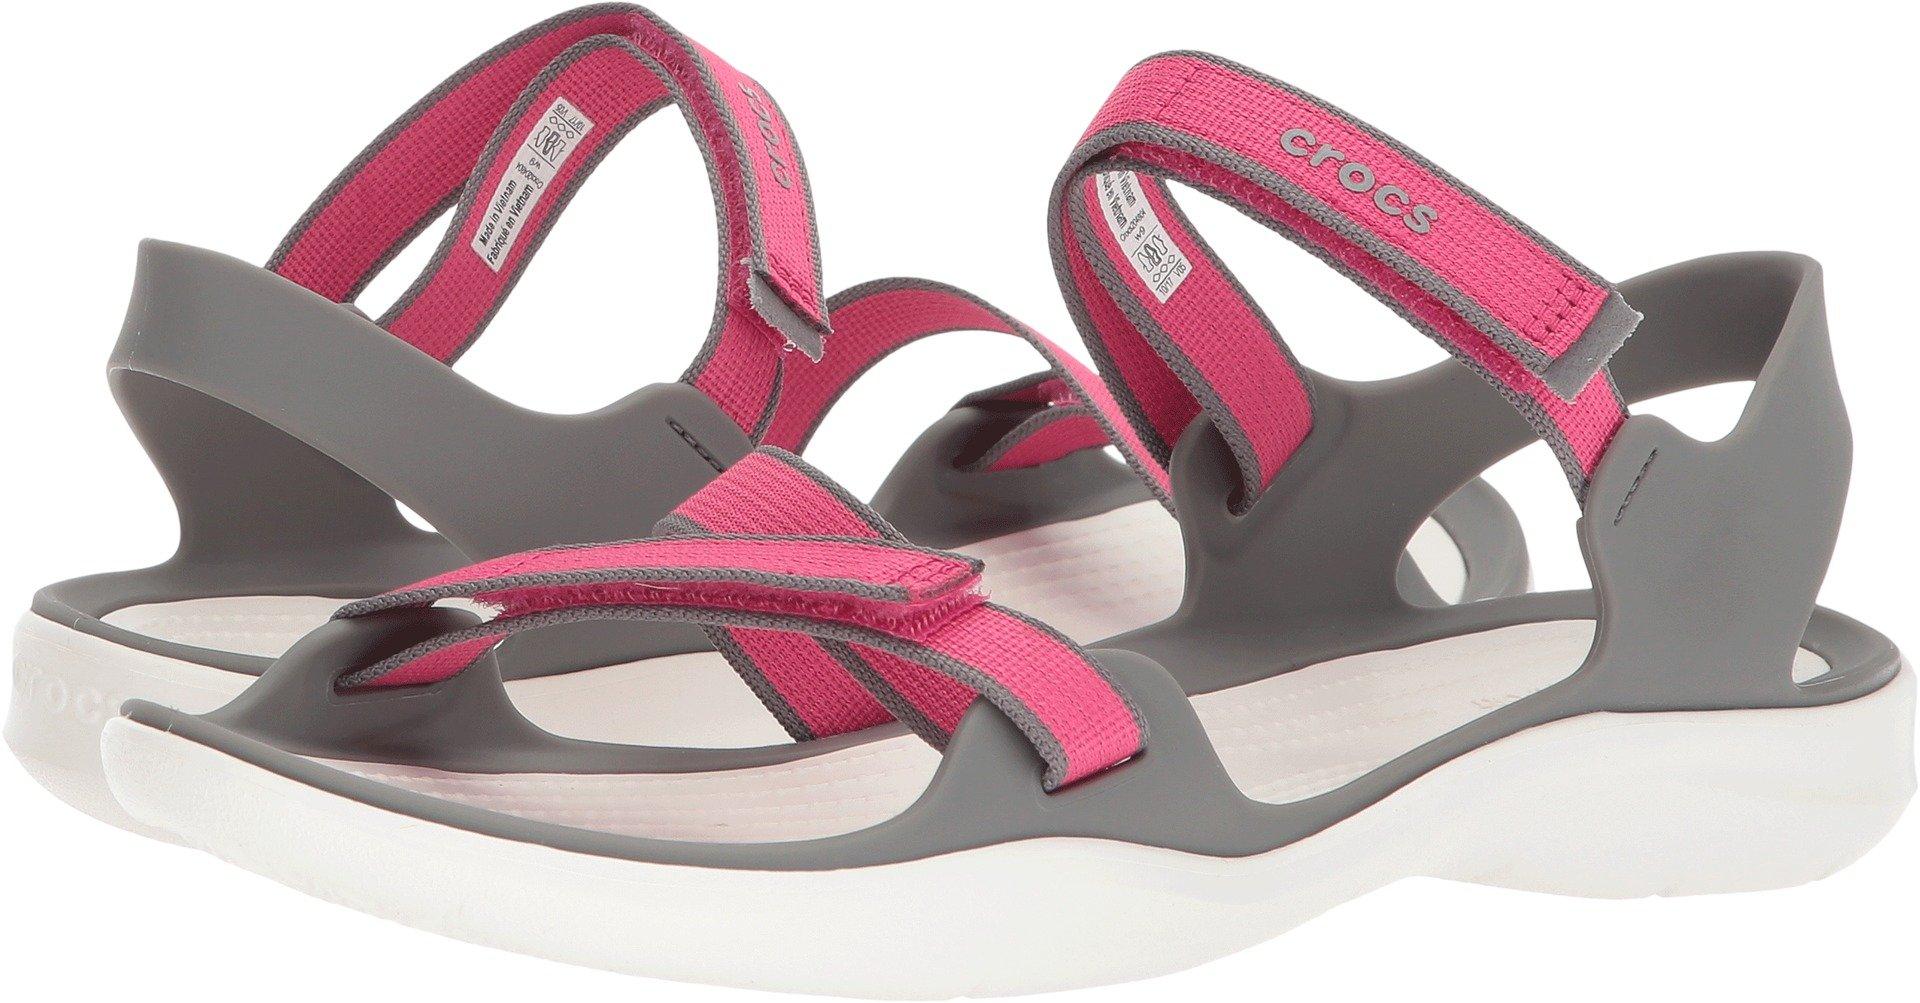 Crocs Women's Swiftwater Webbing W Sport Sandal, Paradise Pink/Smoke, 5 M US